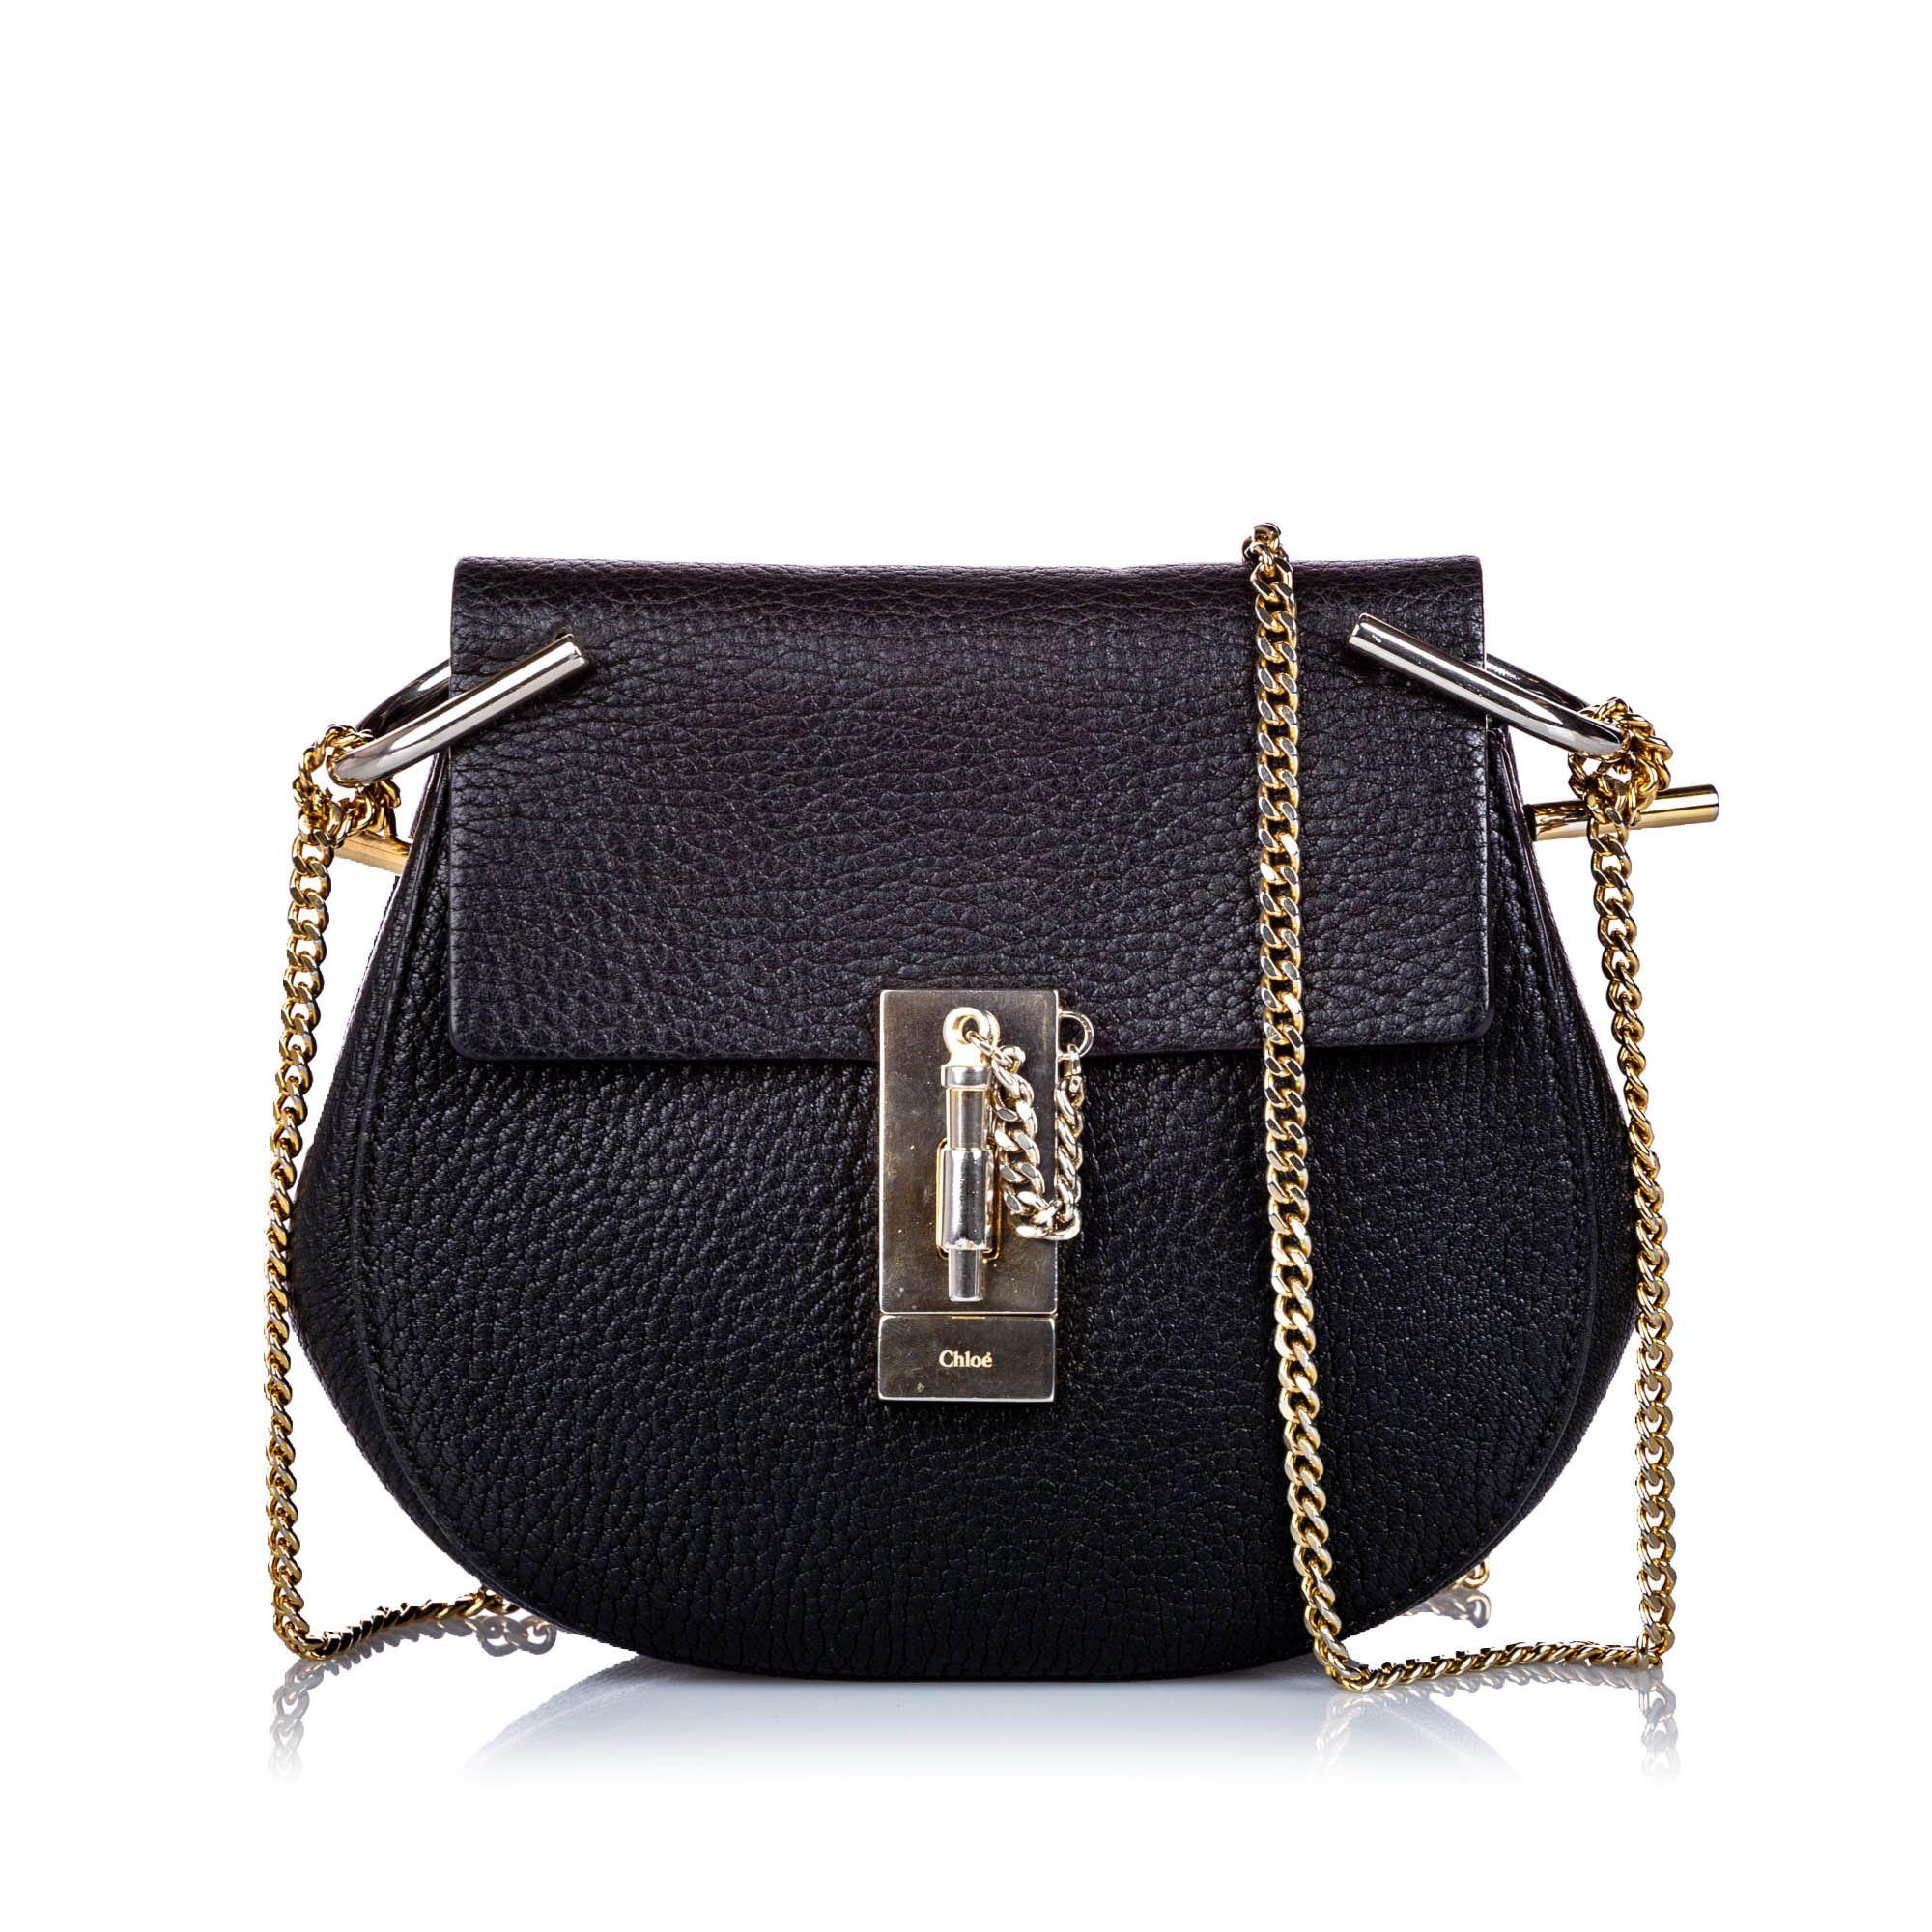 Vintage Chloe Small Grained Leather Drew Crossbody Bag Black